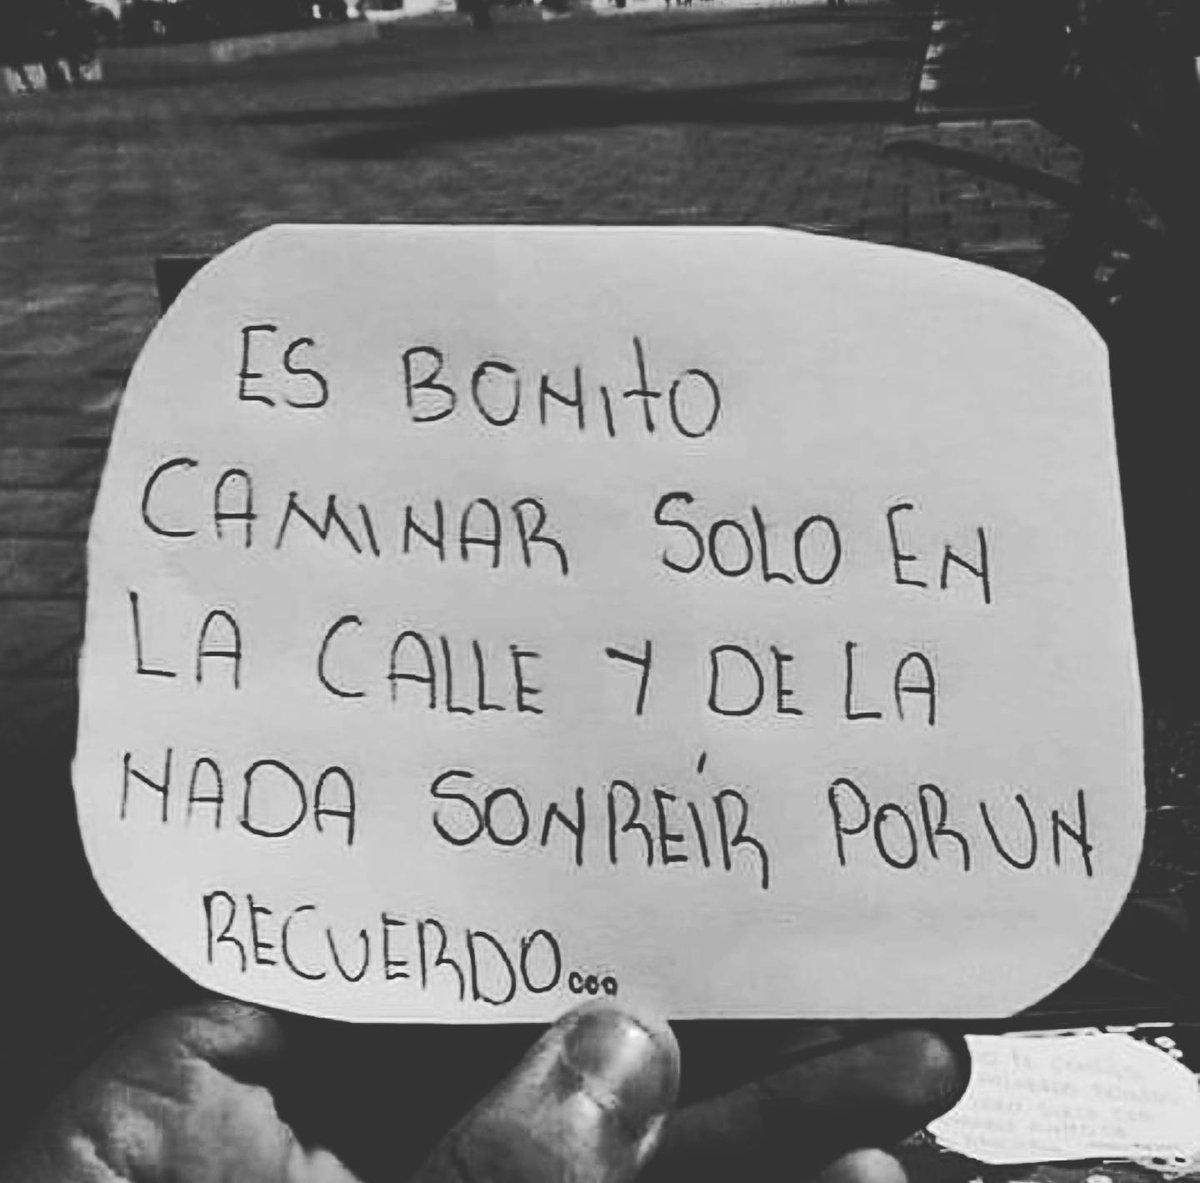 Quijotadas De Amor On Twitter Quijotadasdeamor Es